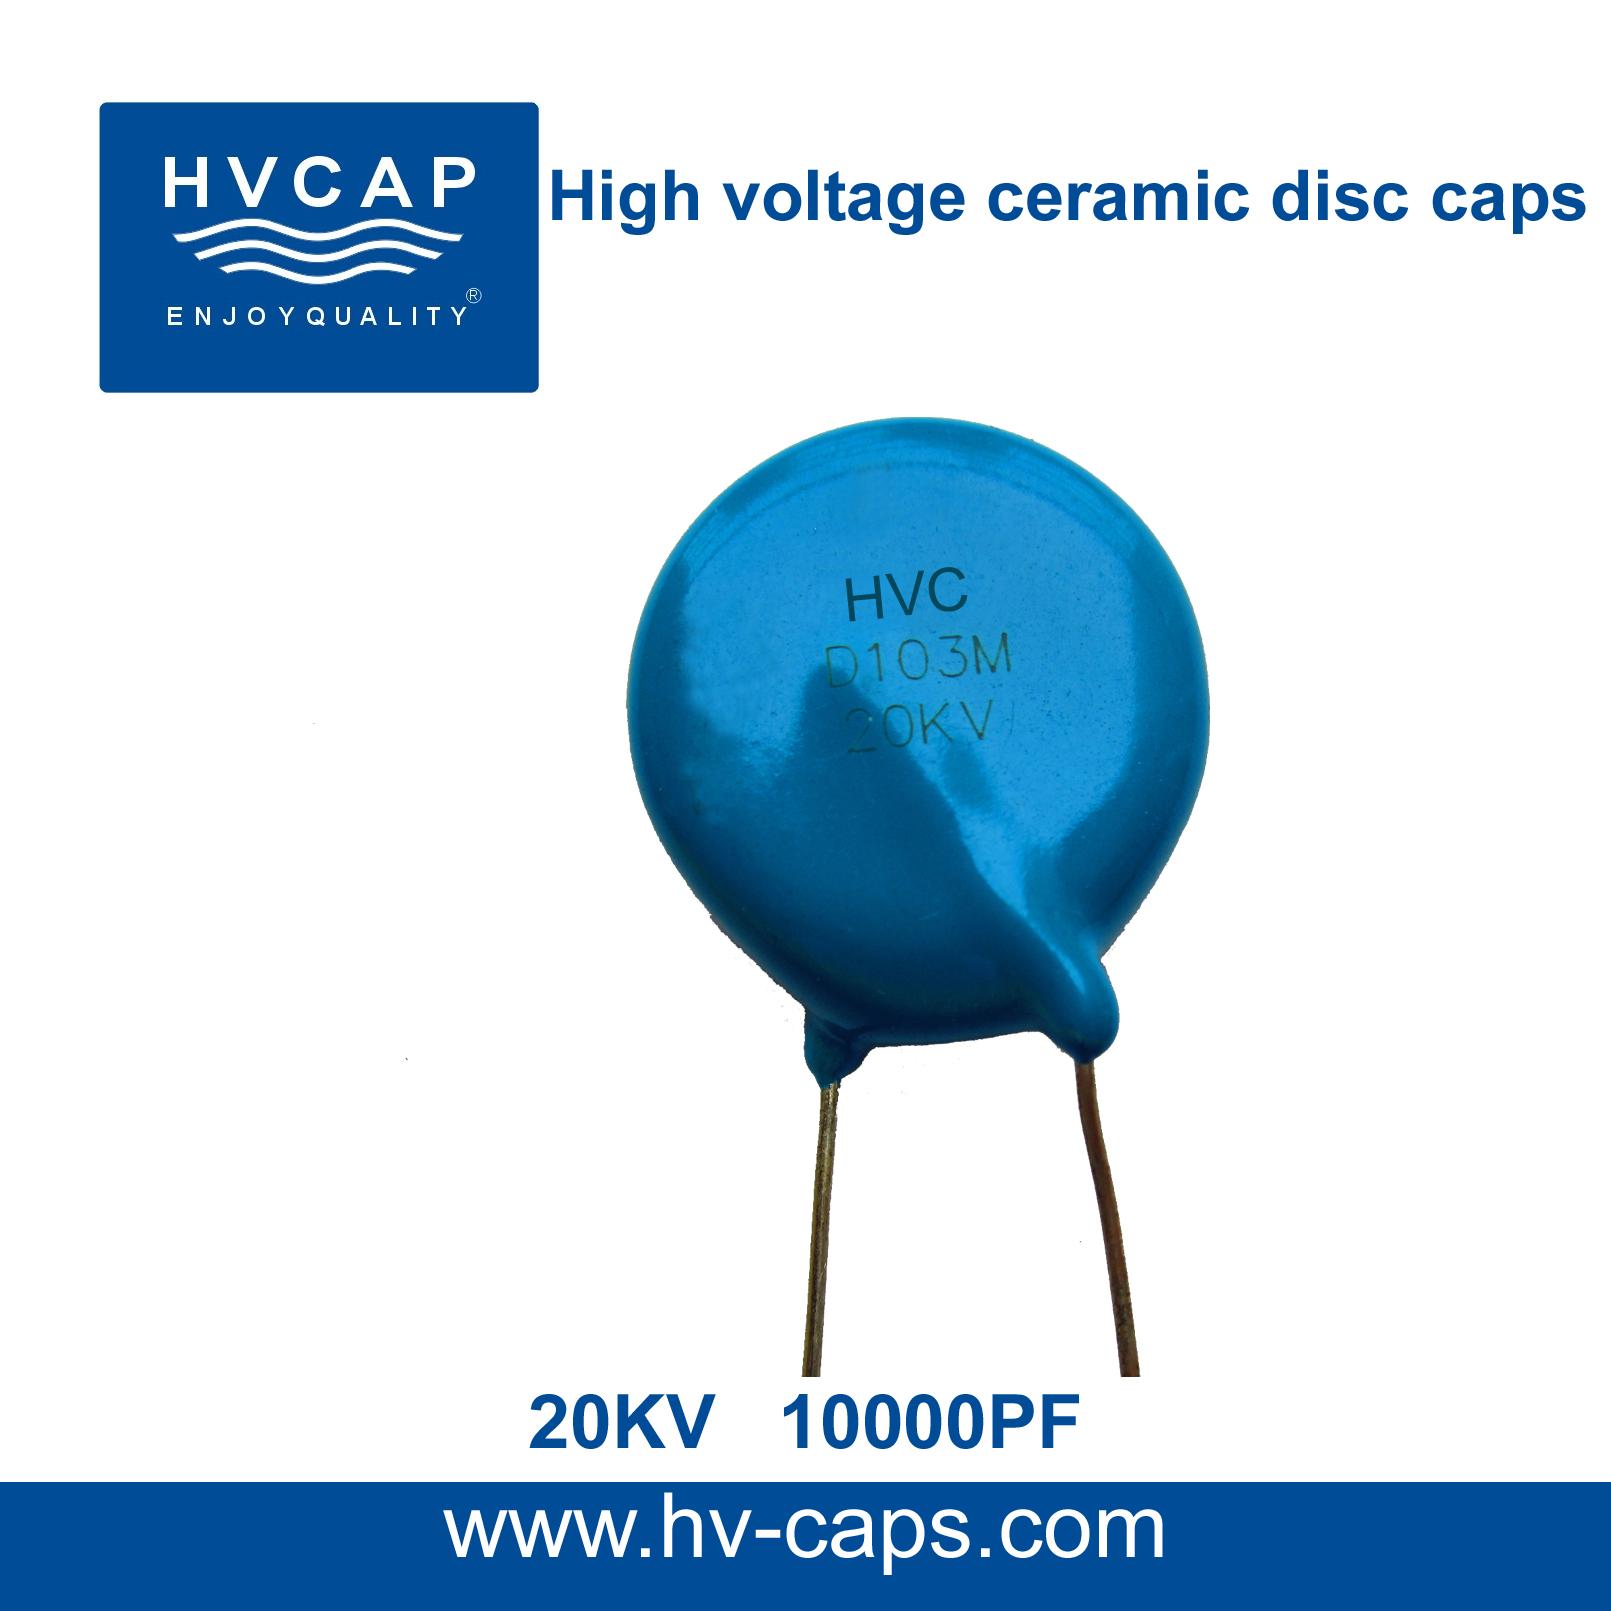 Hoë Spanning Keramiese Skyfkondensator 20KV 10000PF (20KV 103M)